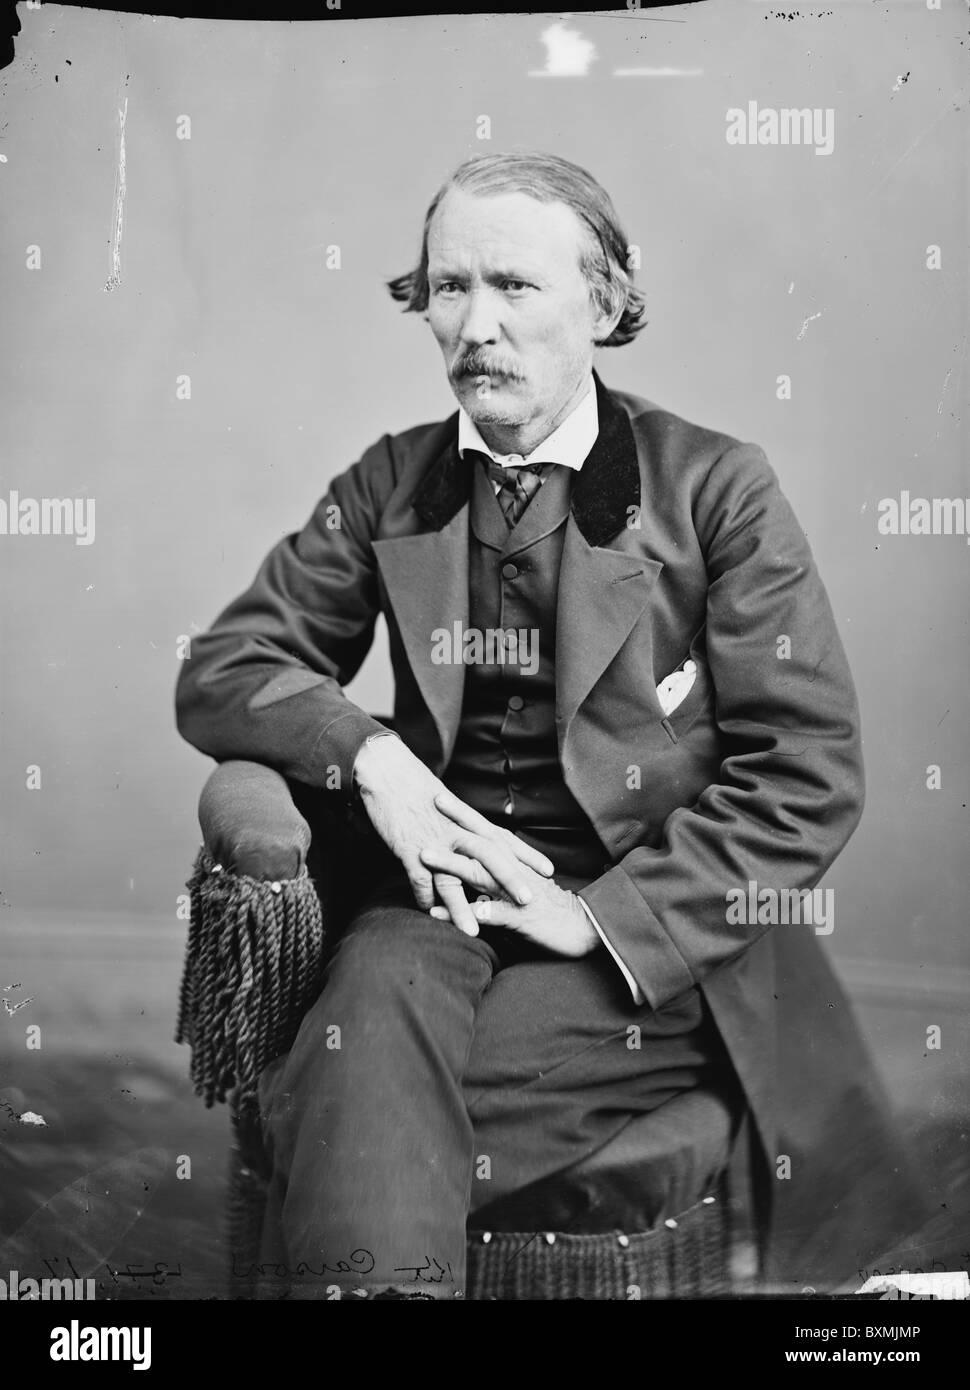 Christopher (Kit) Carson indian wars - Stock Image